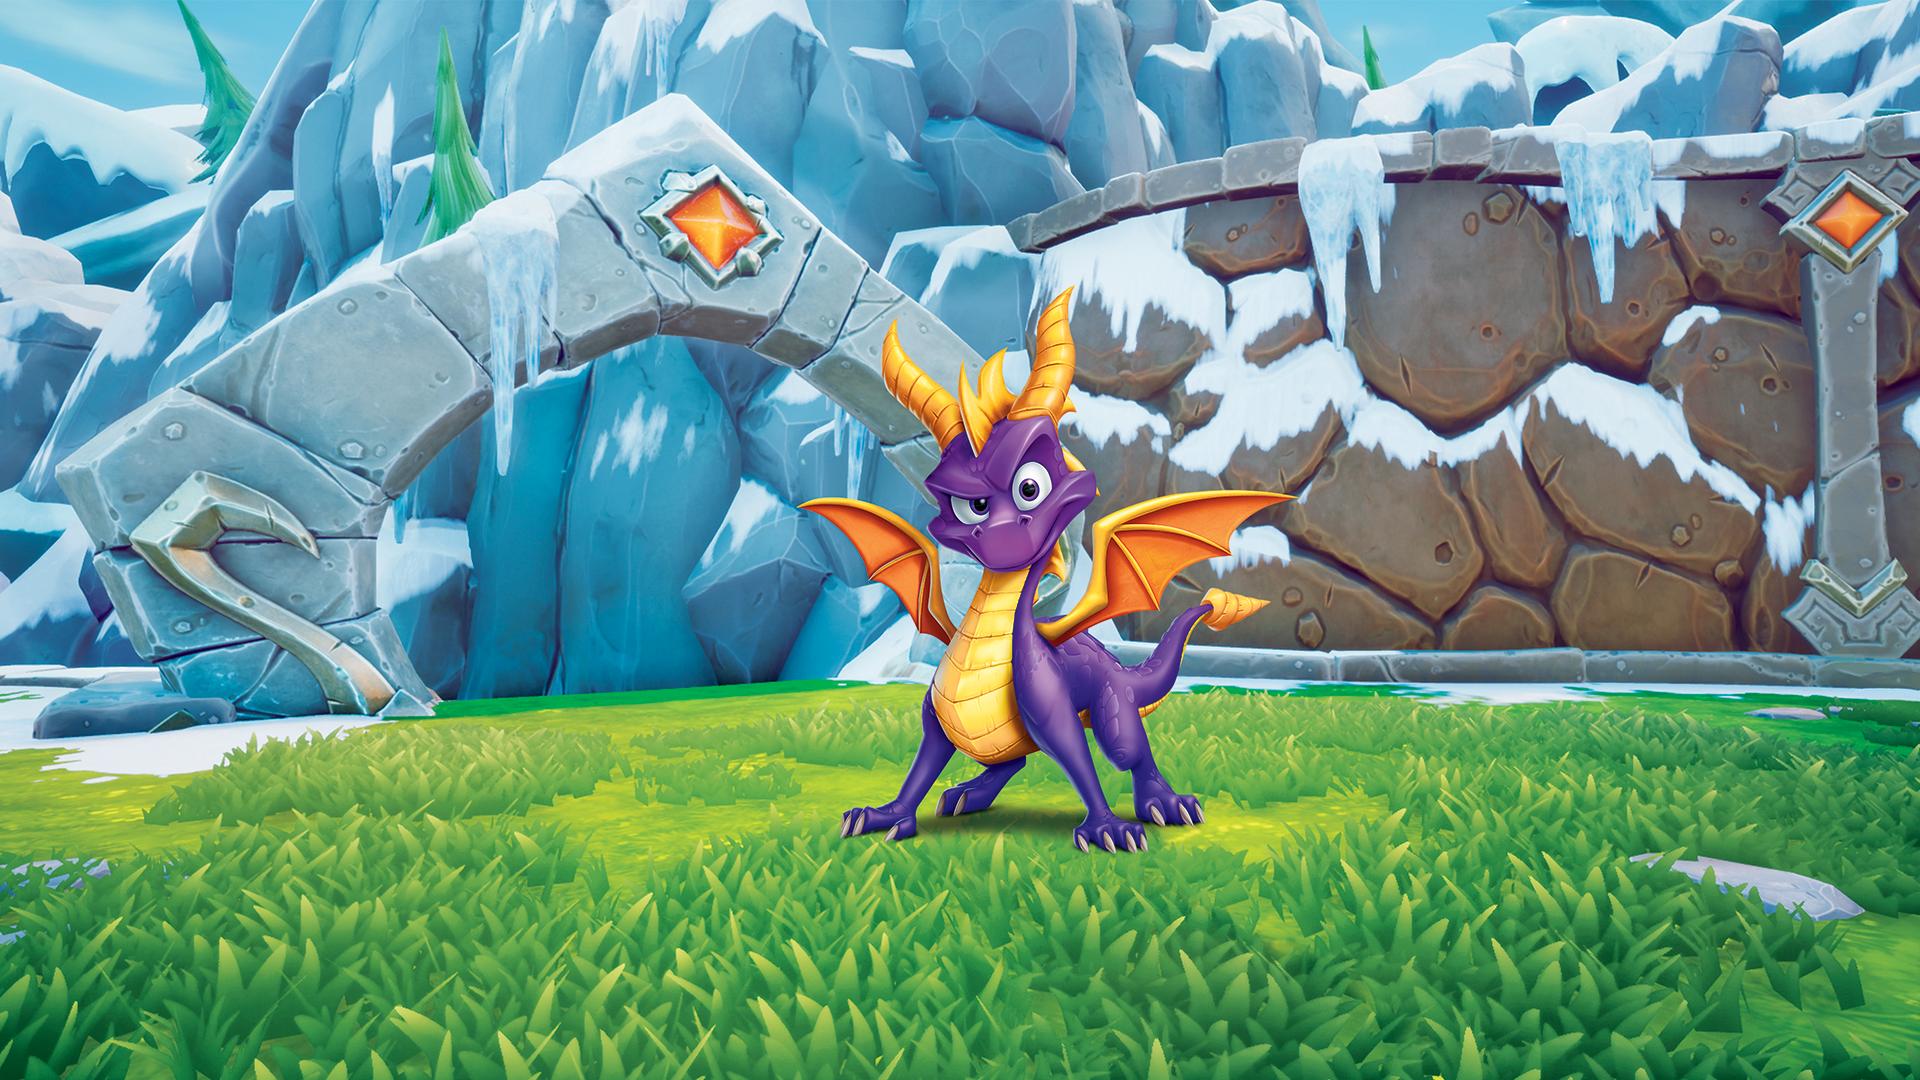 Video Game - Spyro the Dragon  Spyro (Character) Wallpaper